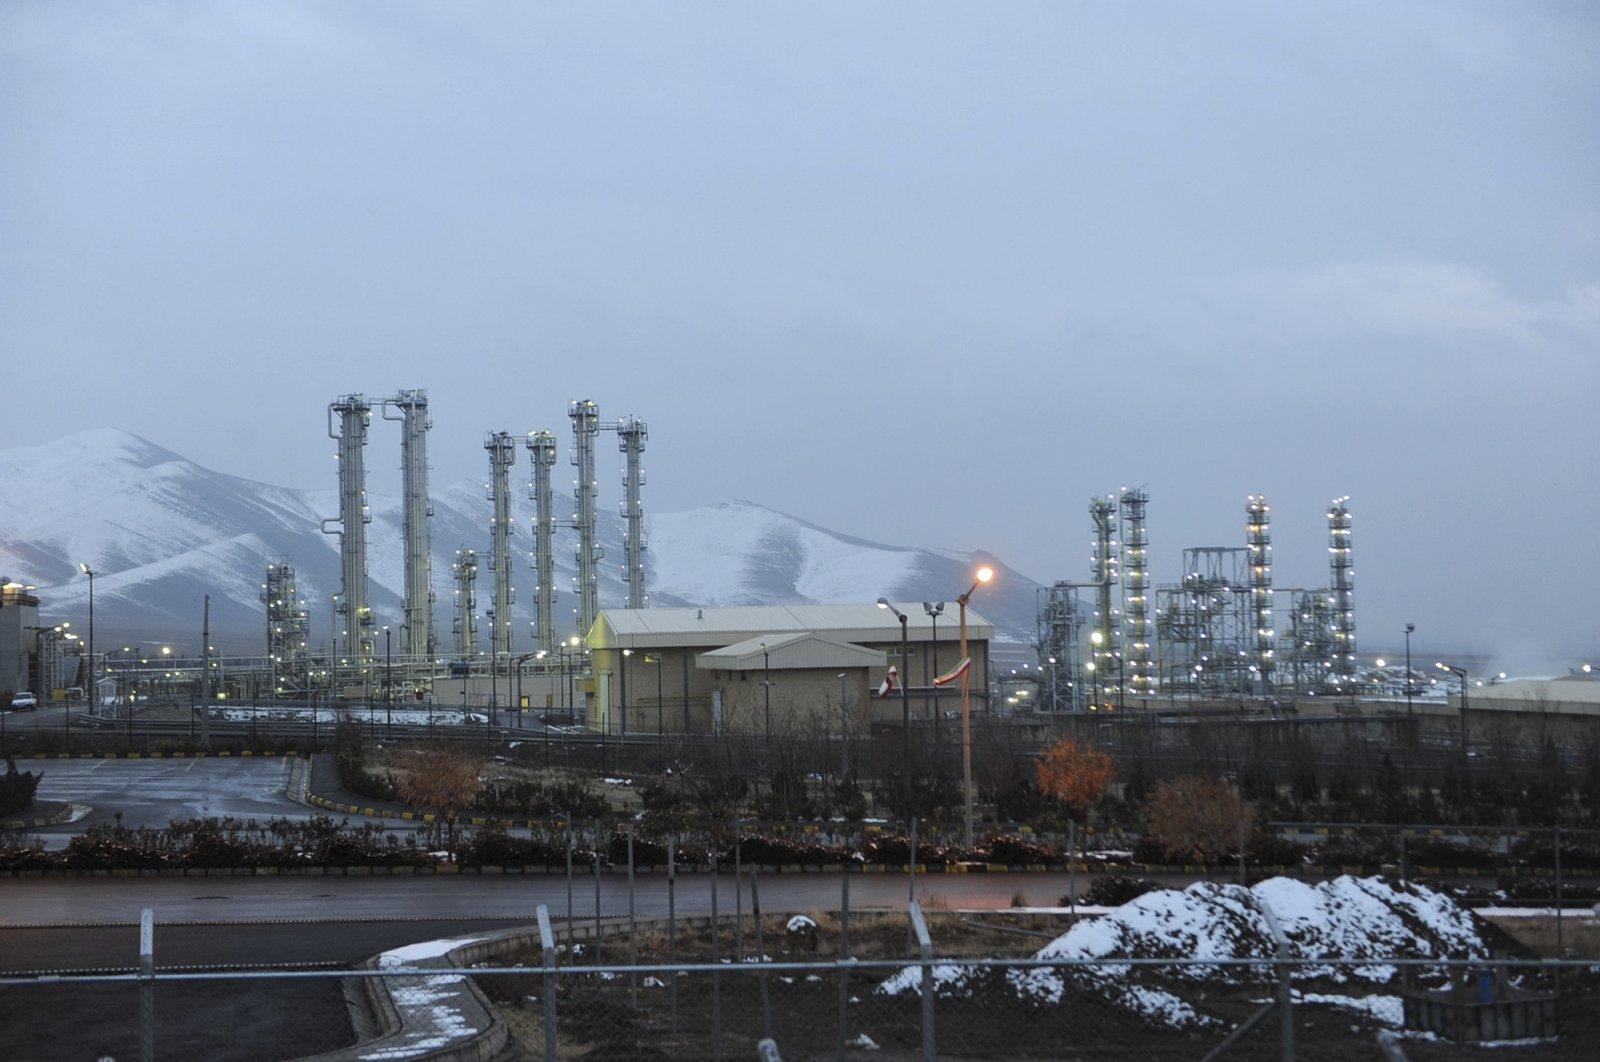 The Arak heavy-water nuclear facilities, near the central city of Arak, 250 kilometers (150 miles) southwest of the capital Tehran, Iran, Jan. 15, 2011. (AP Photo)